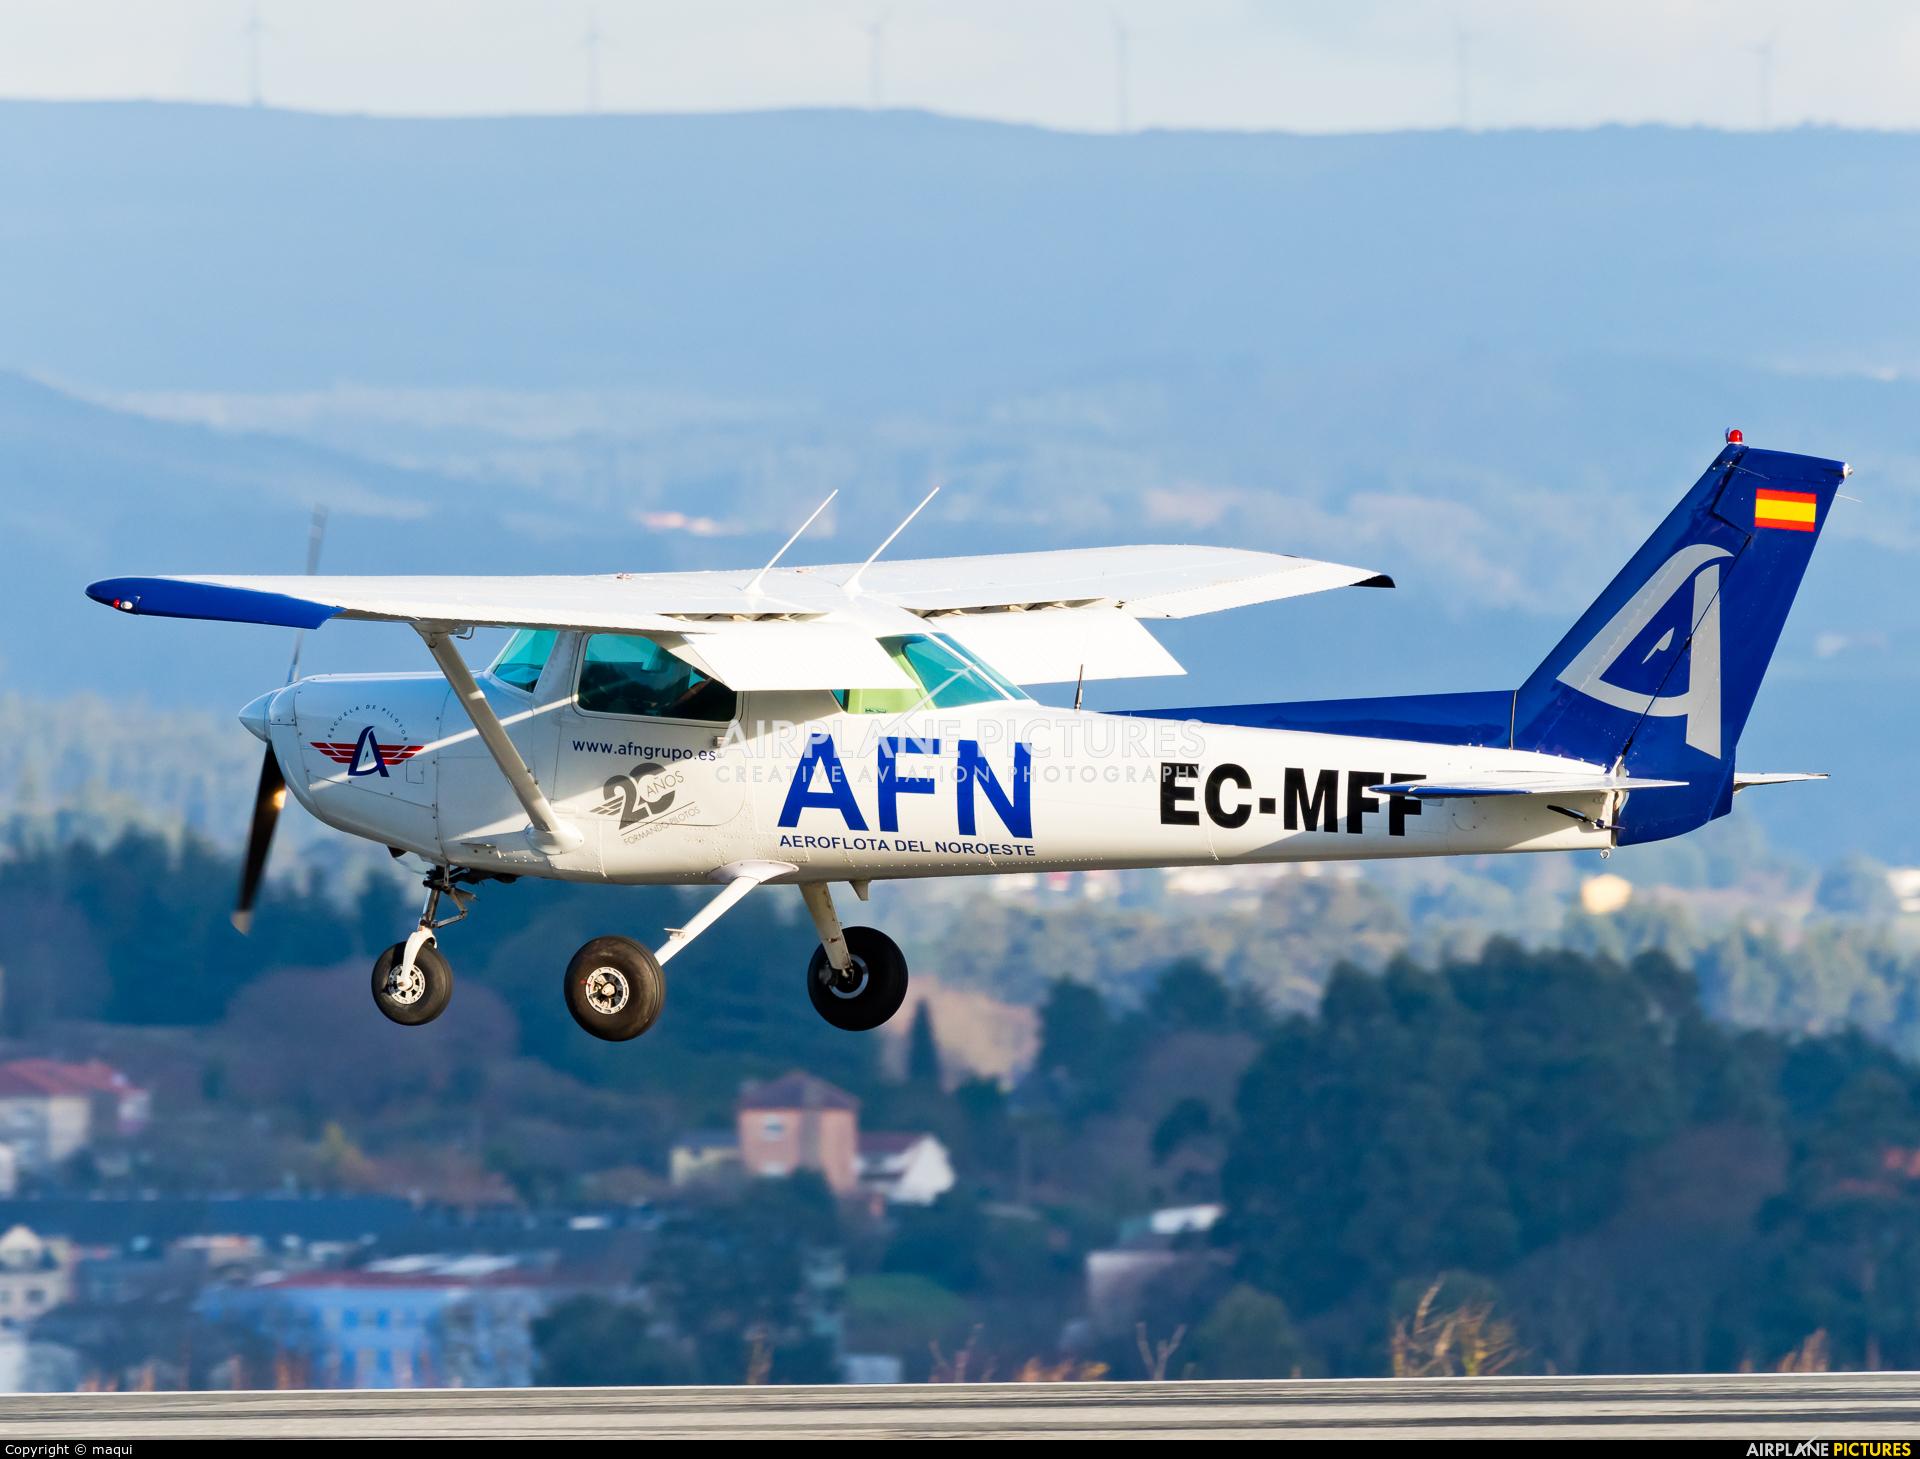 Aeroflota del Noroeste EC-MFF aircraft at La Coruña